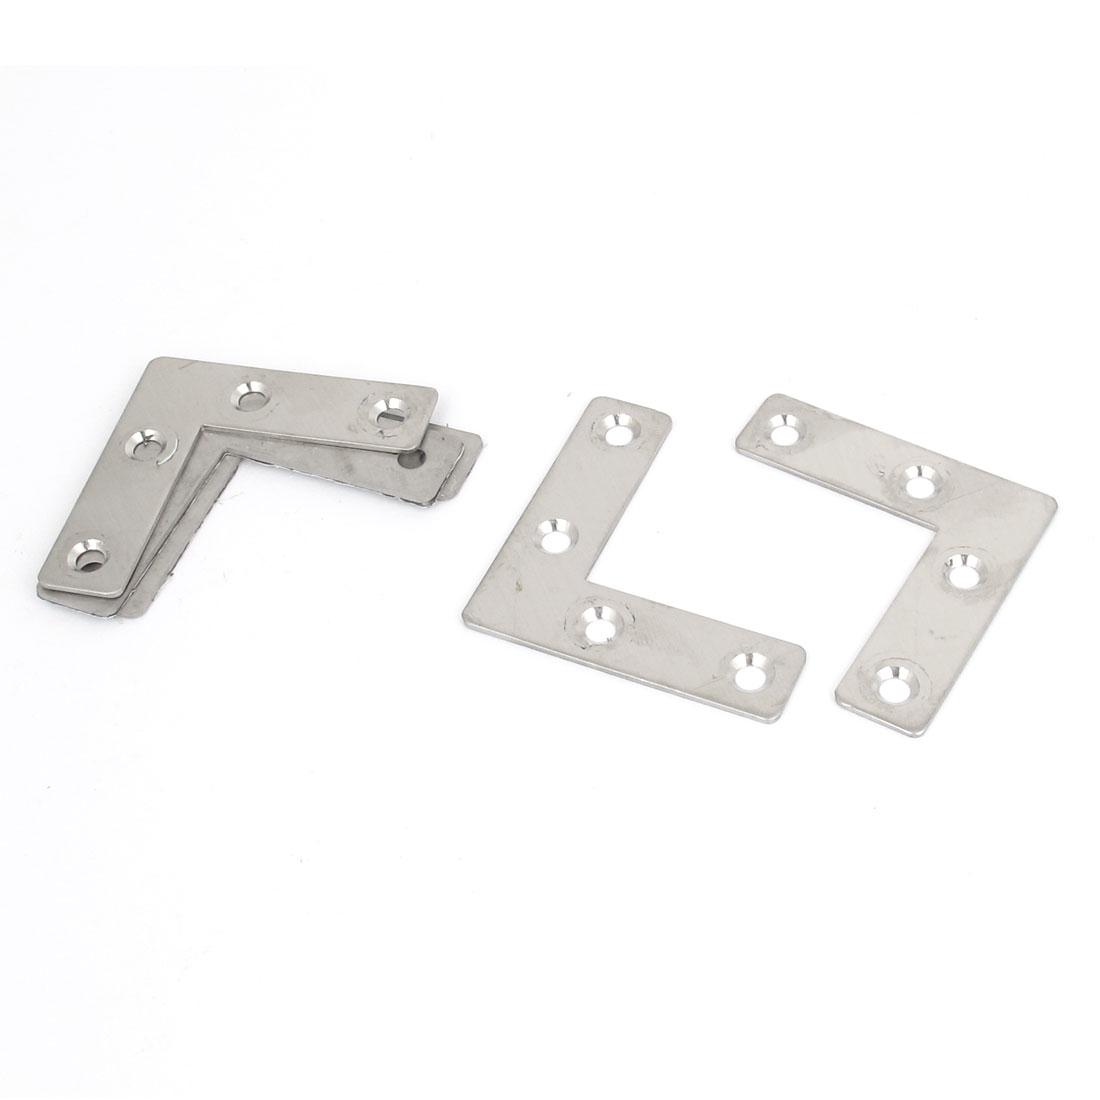 50mmx50mm Flat L Shape Corner Brace Fixing Repair Plate Right Angle Bracket 5pcs